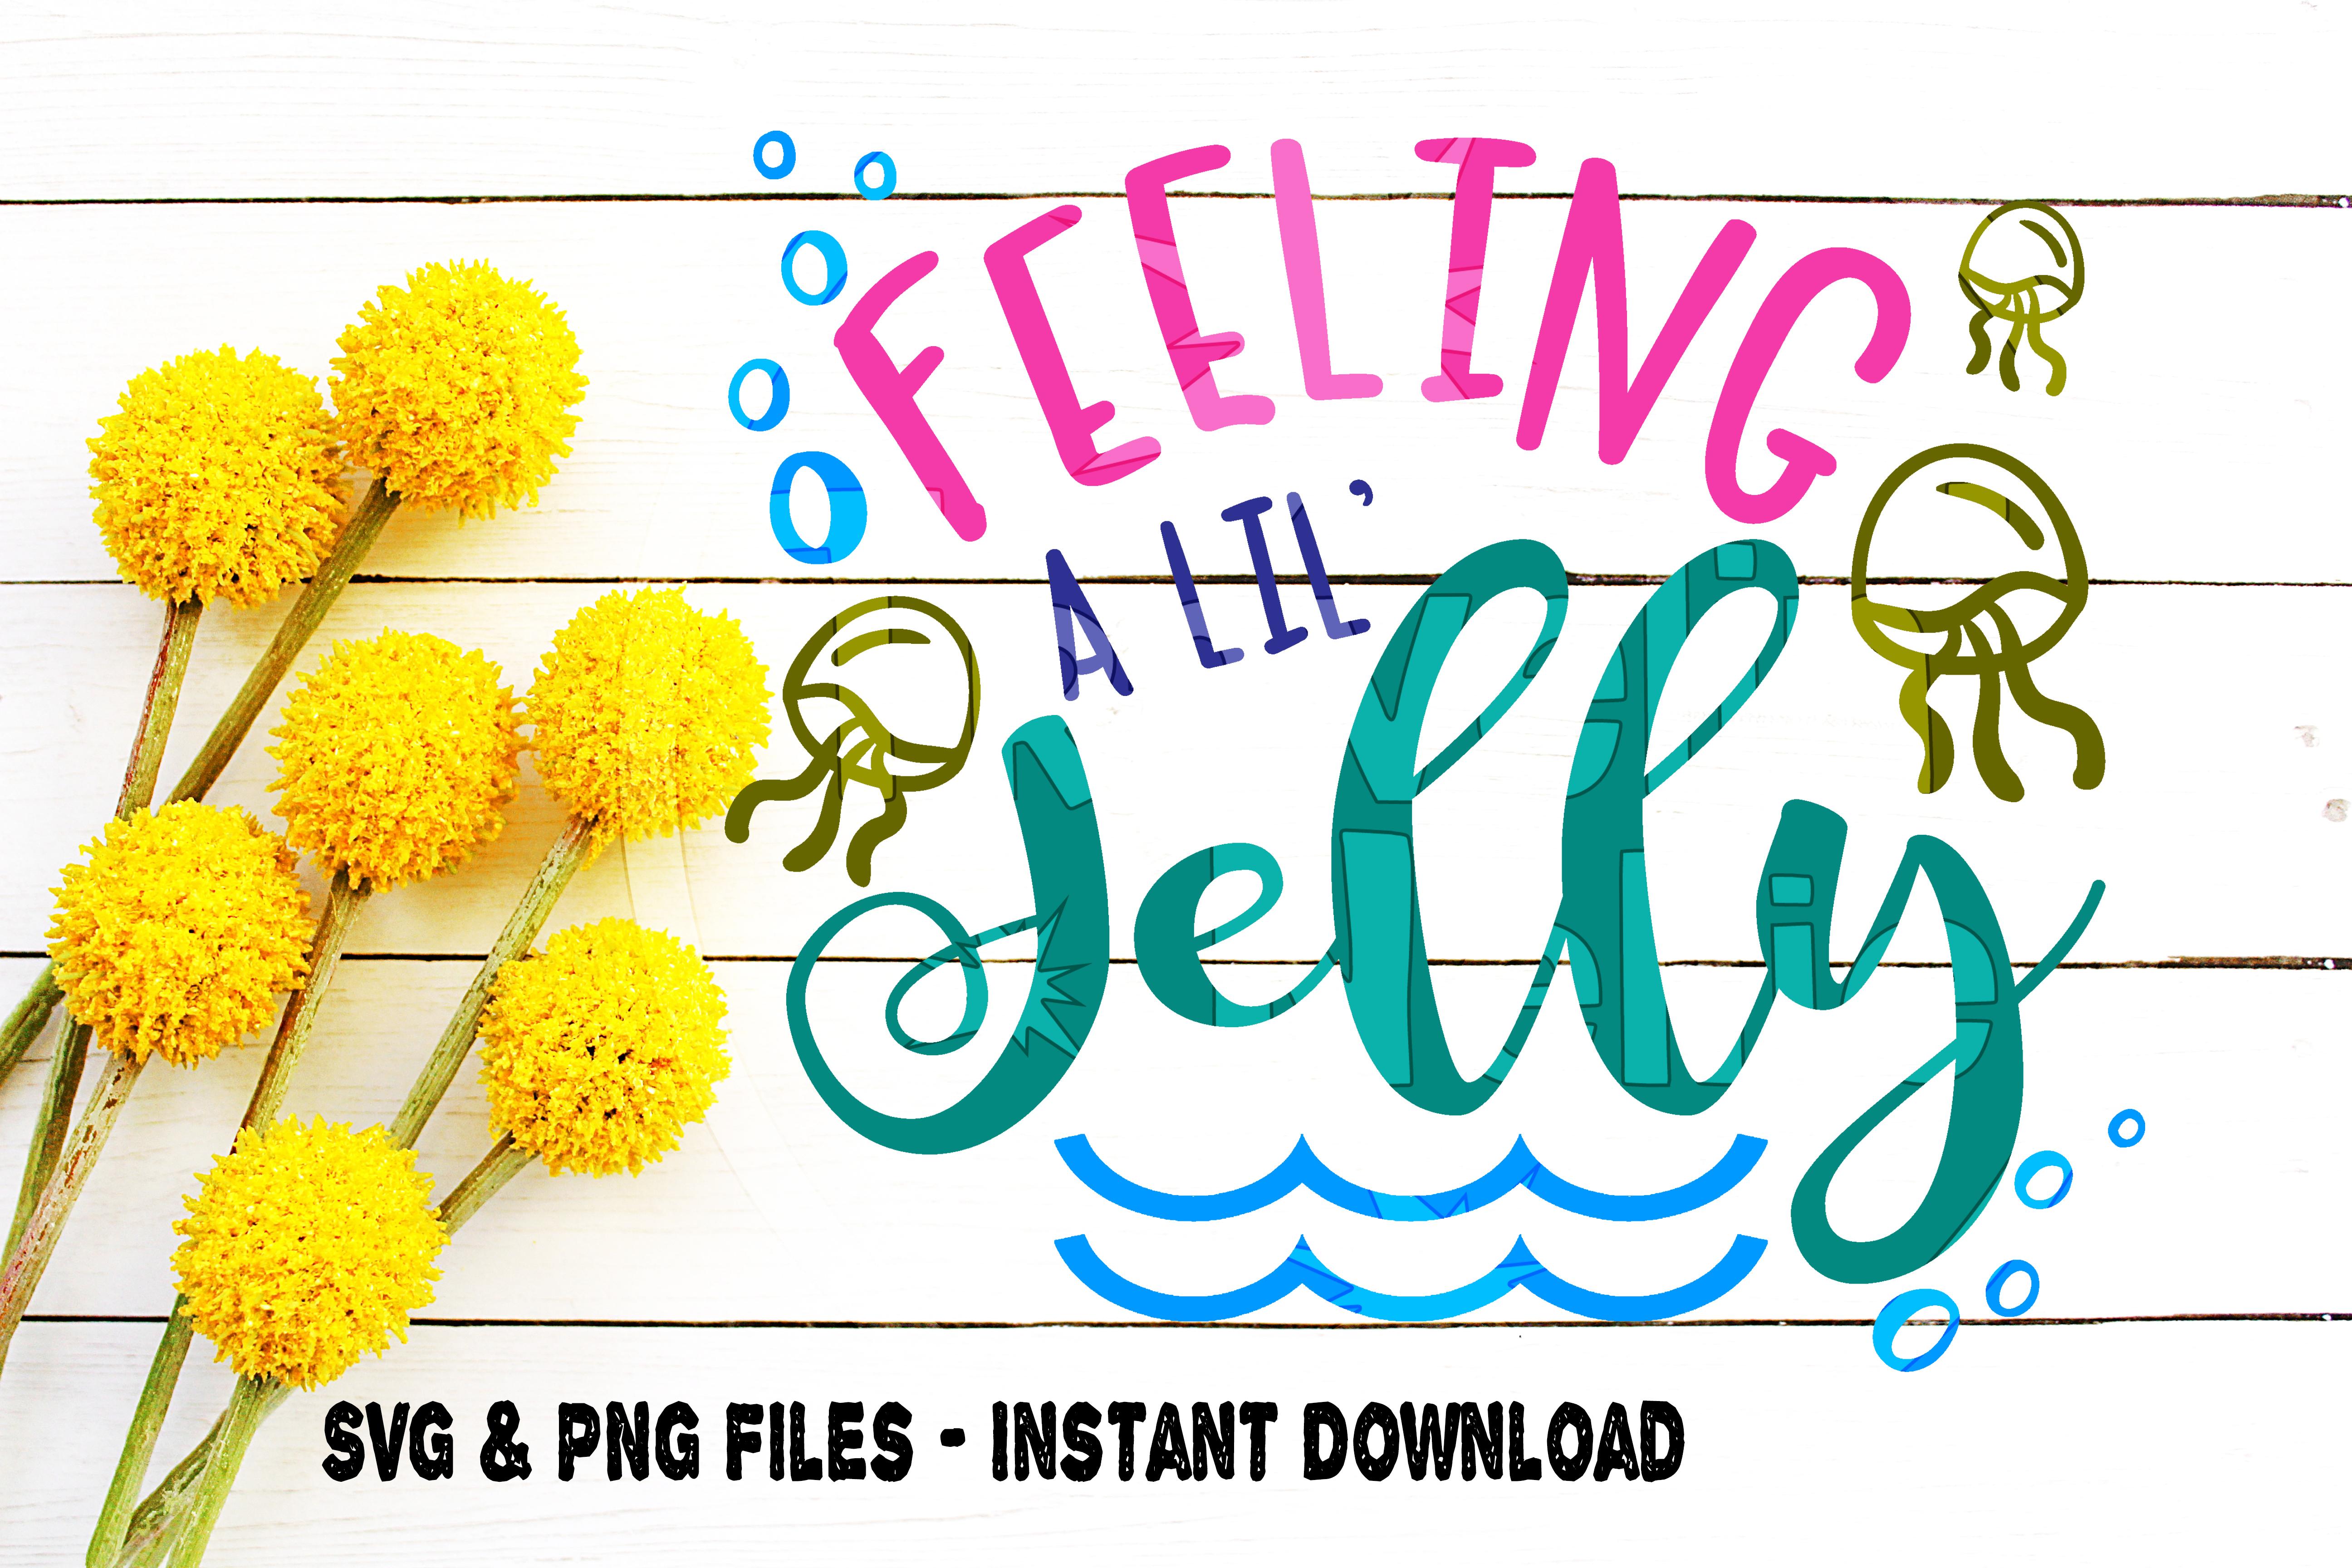 SVG Beach Bundle, 4, Beach Moods svg, Emotions svg, Feeling Nauti svg, Feeling Beachy svg, Feeling Jelly svg, Feeling Salty svg, Cut File example image 3